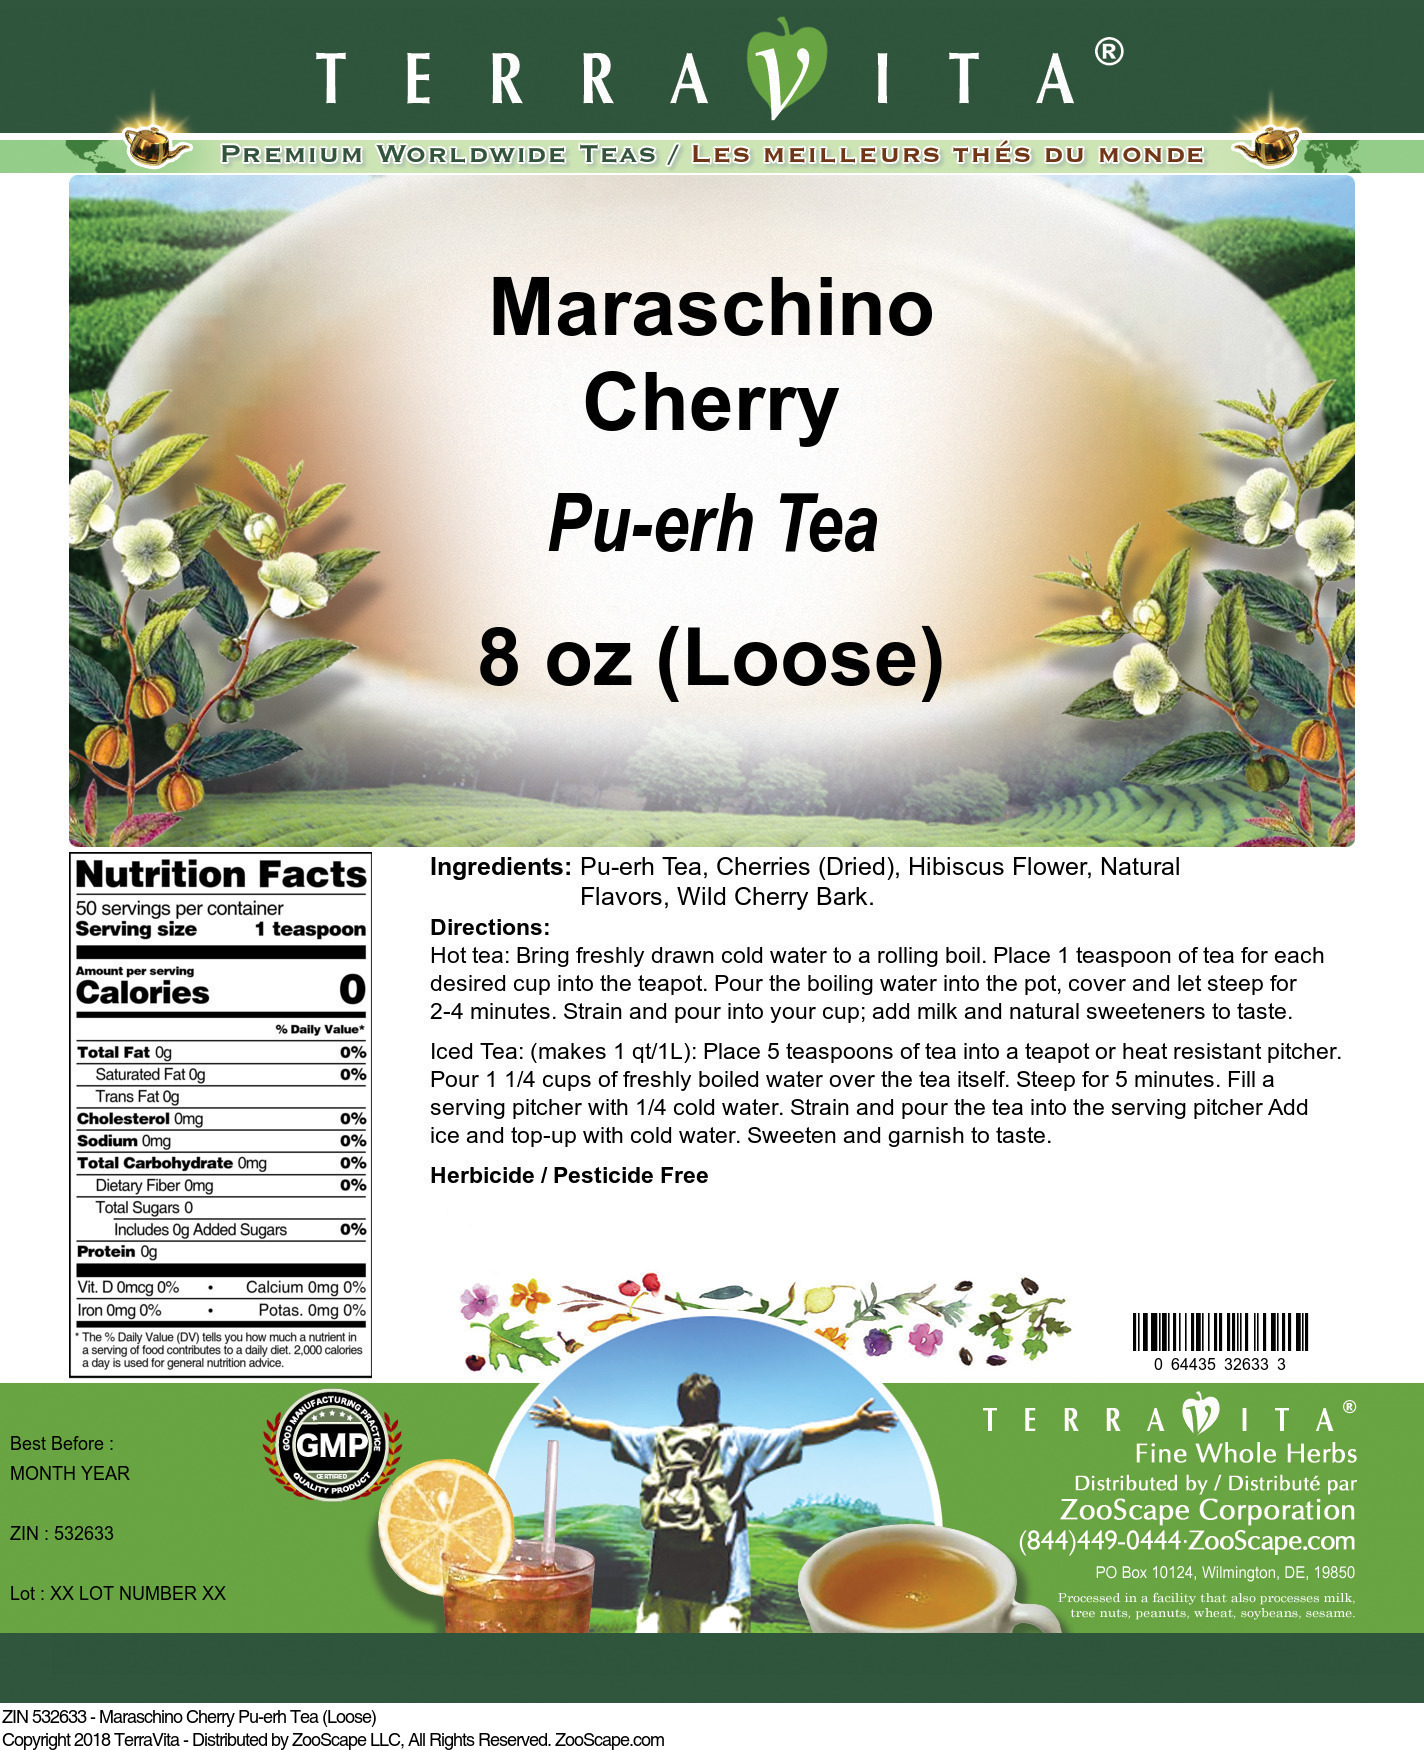 Maraschino Cherry Pu-erh Tea (Loose)